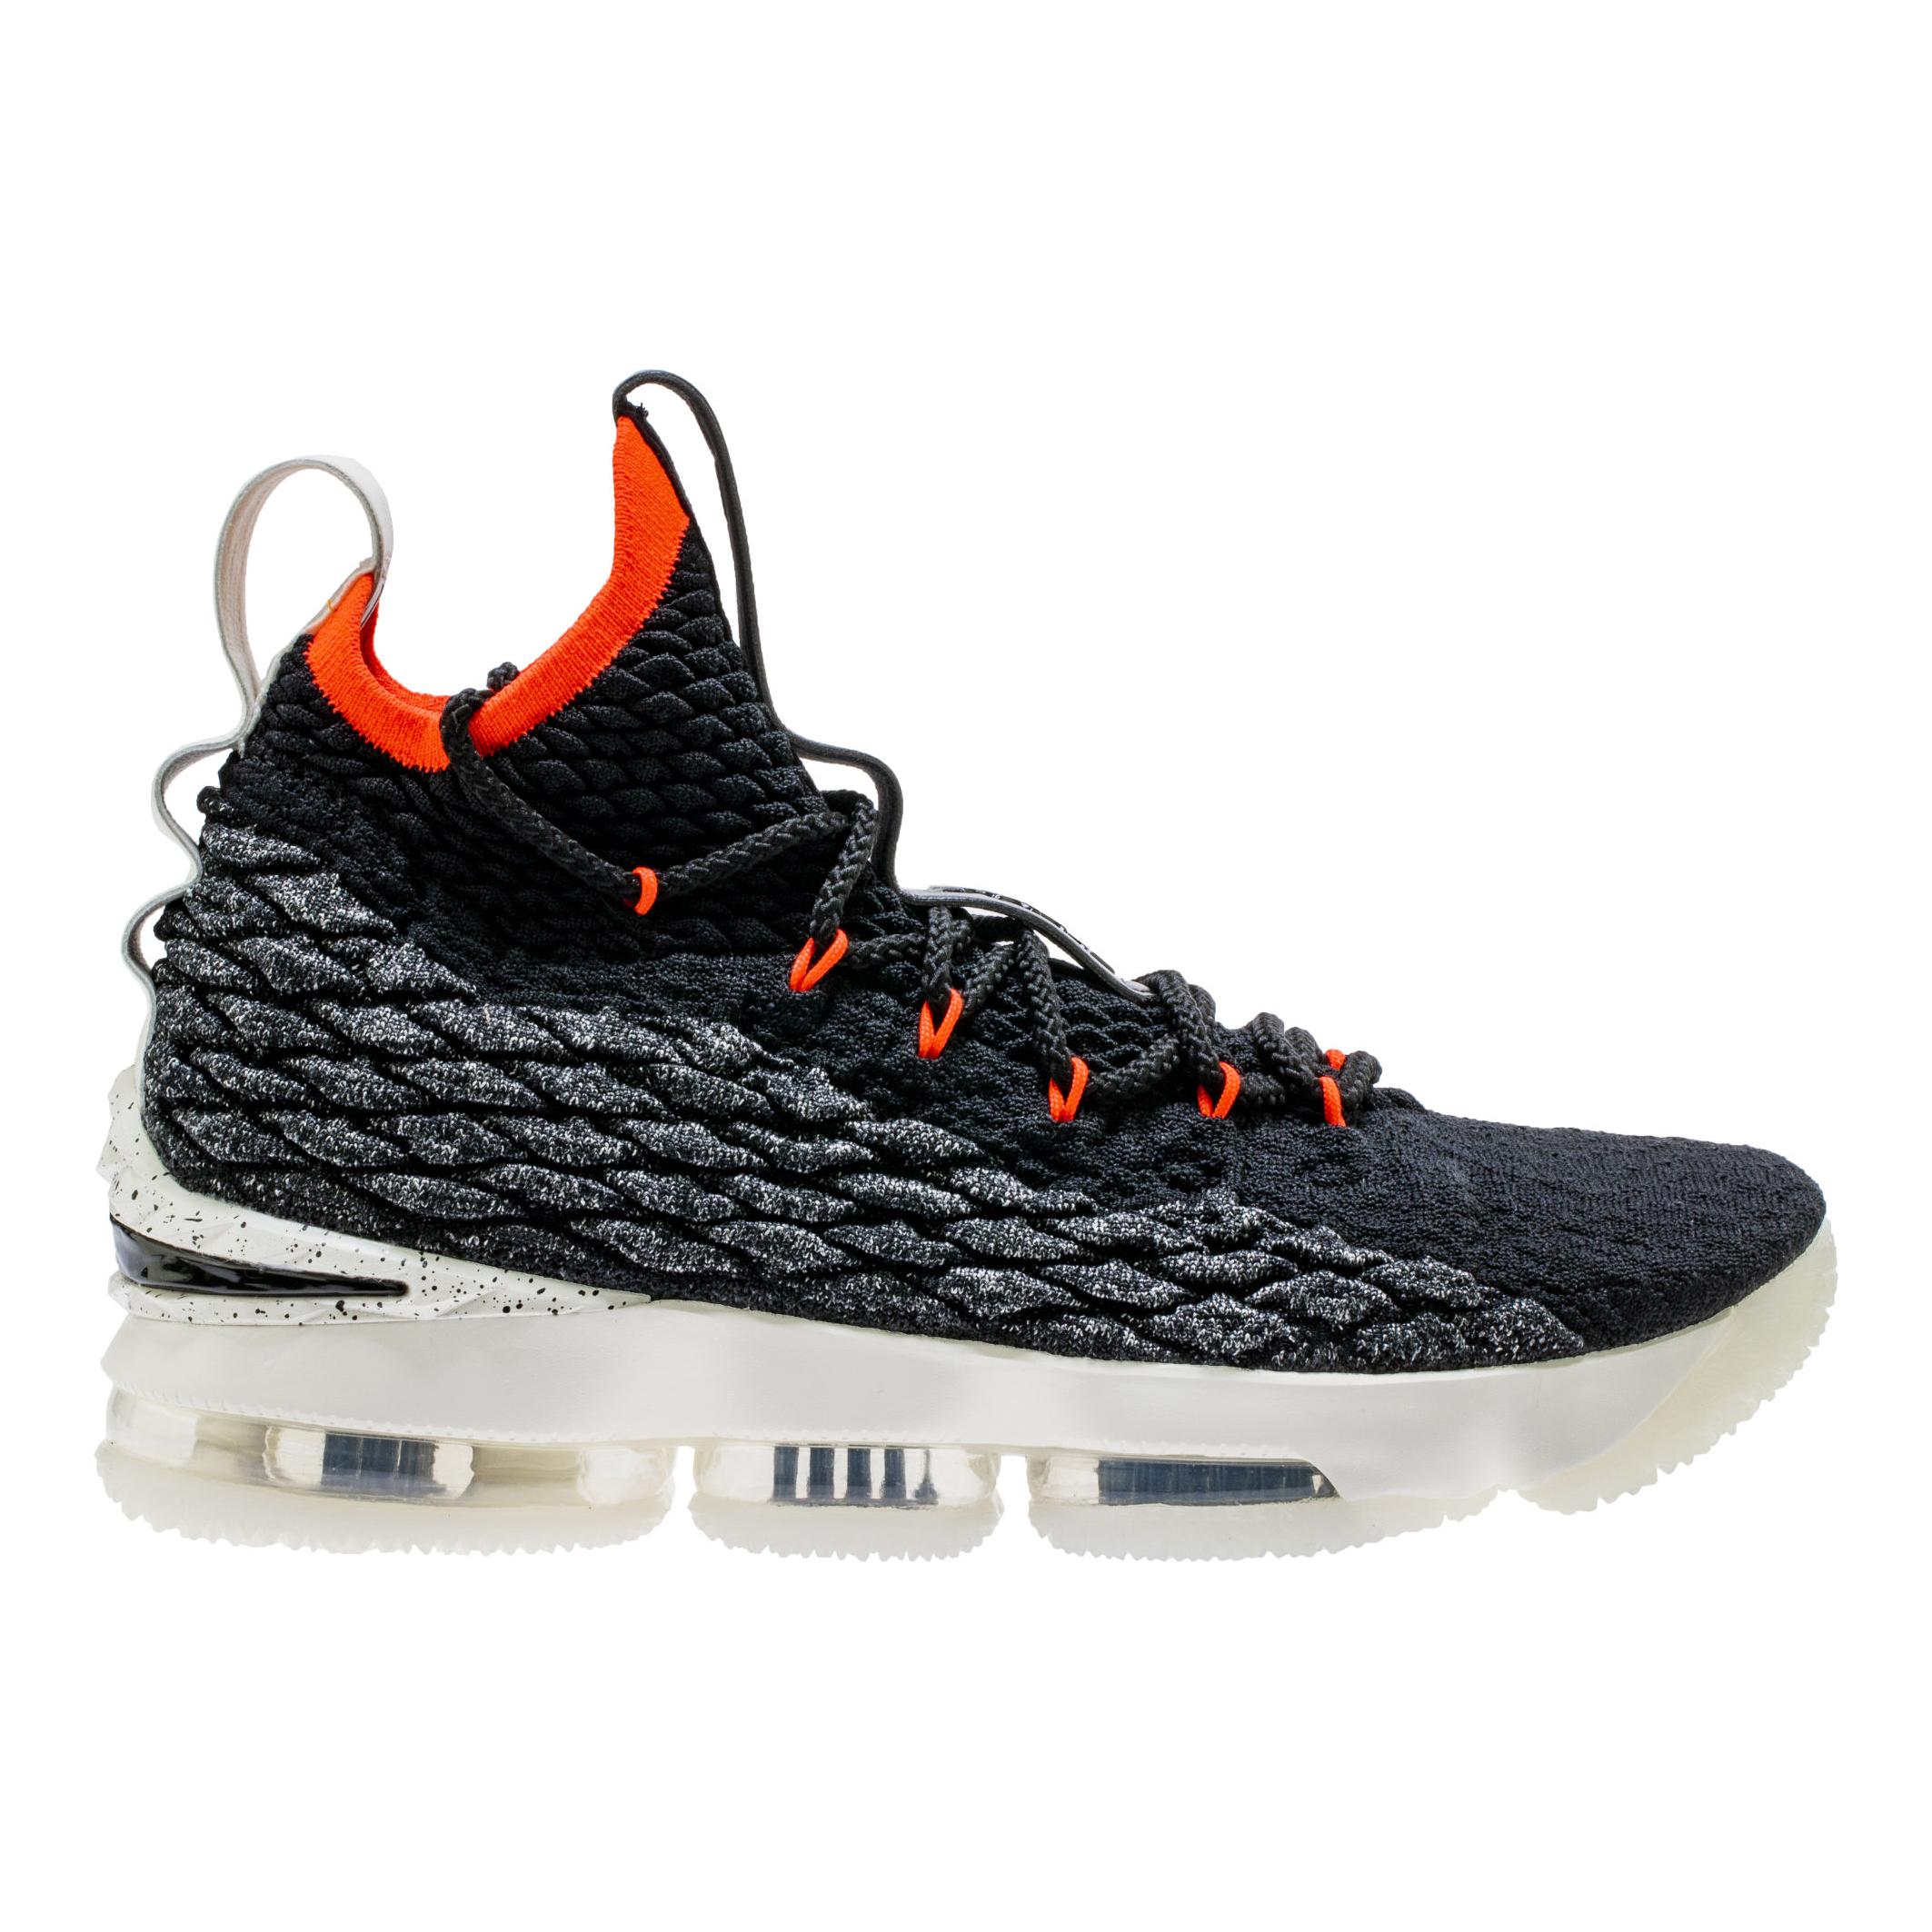 New Nike LeBron 15 'Black/Sail/Bright